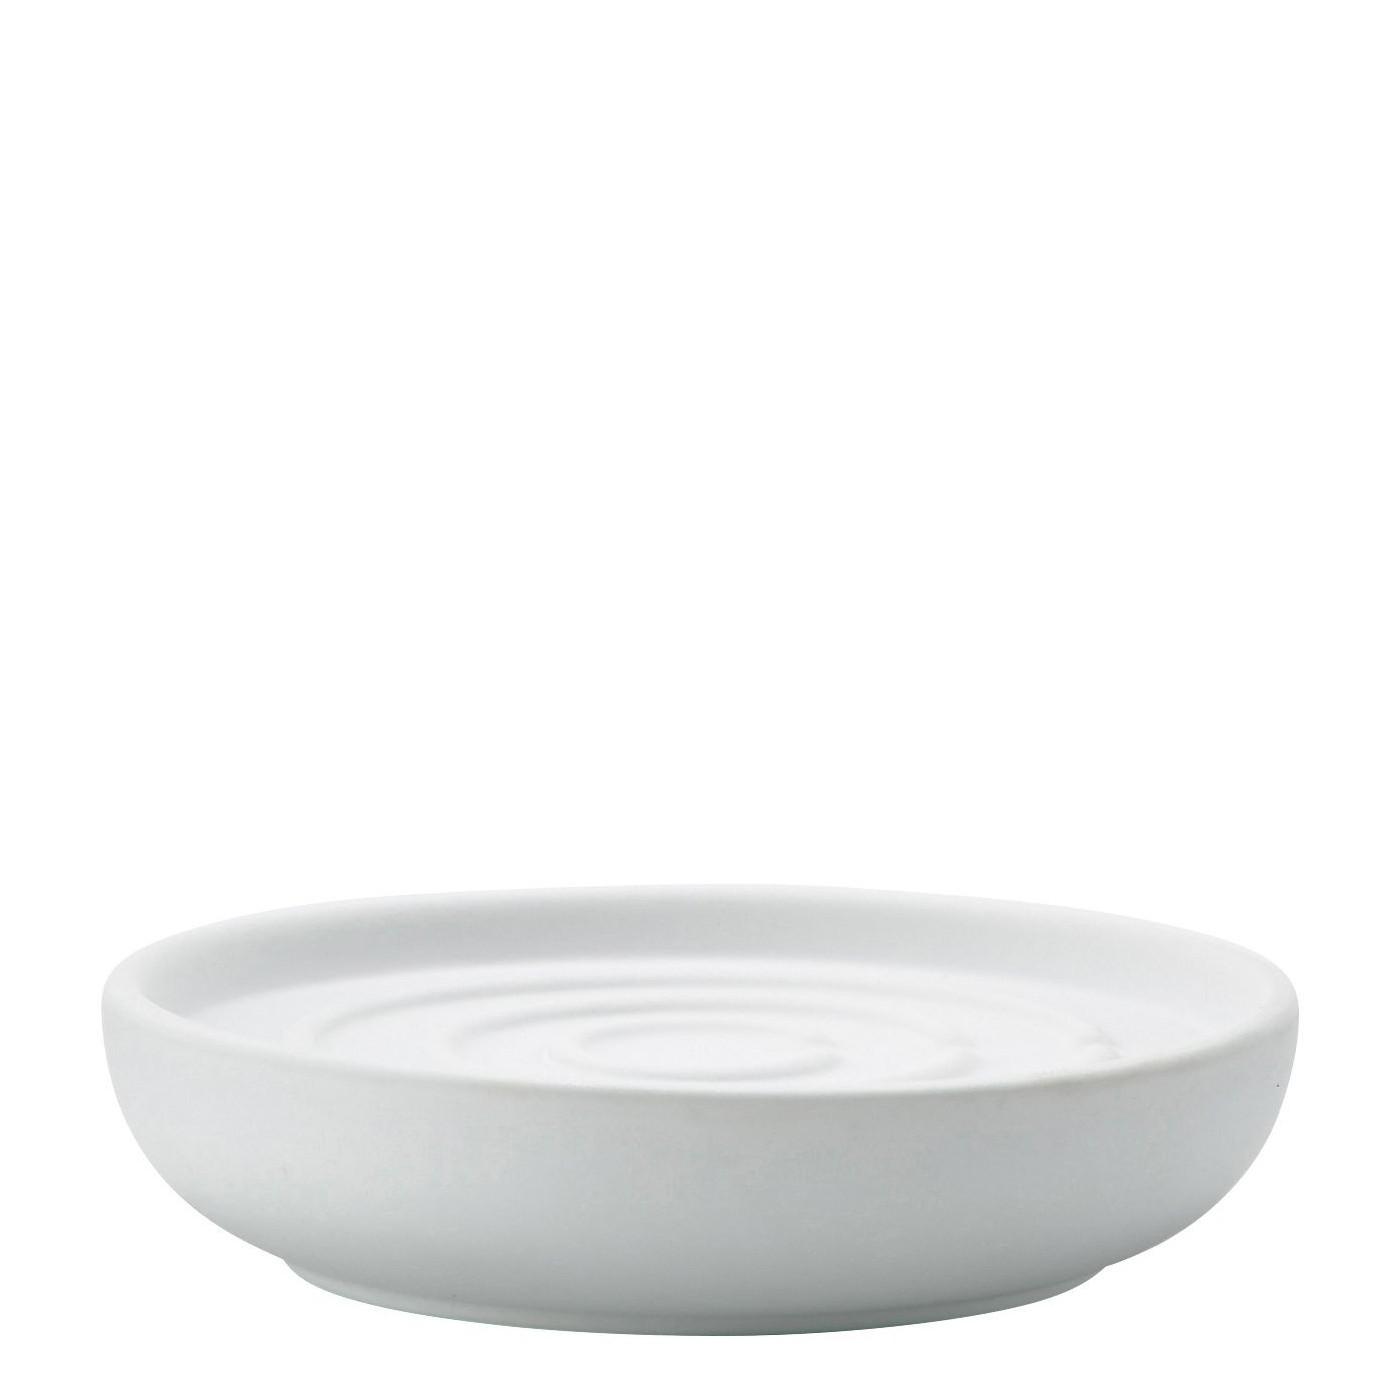 Porte savon blanc